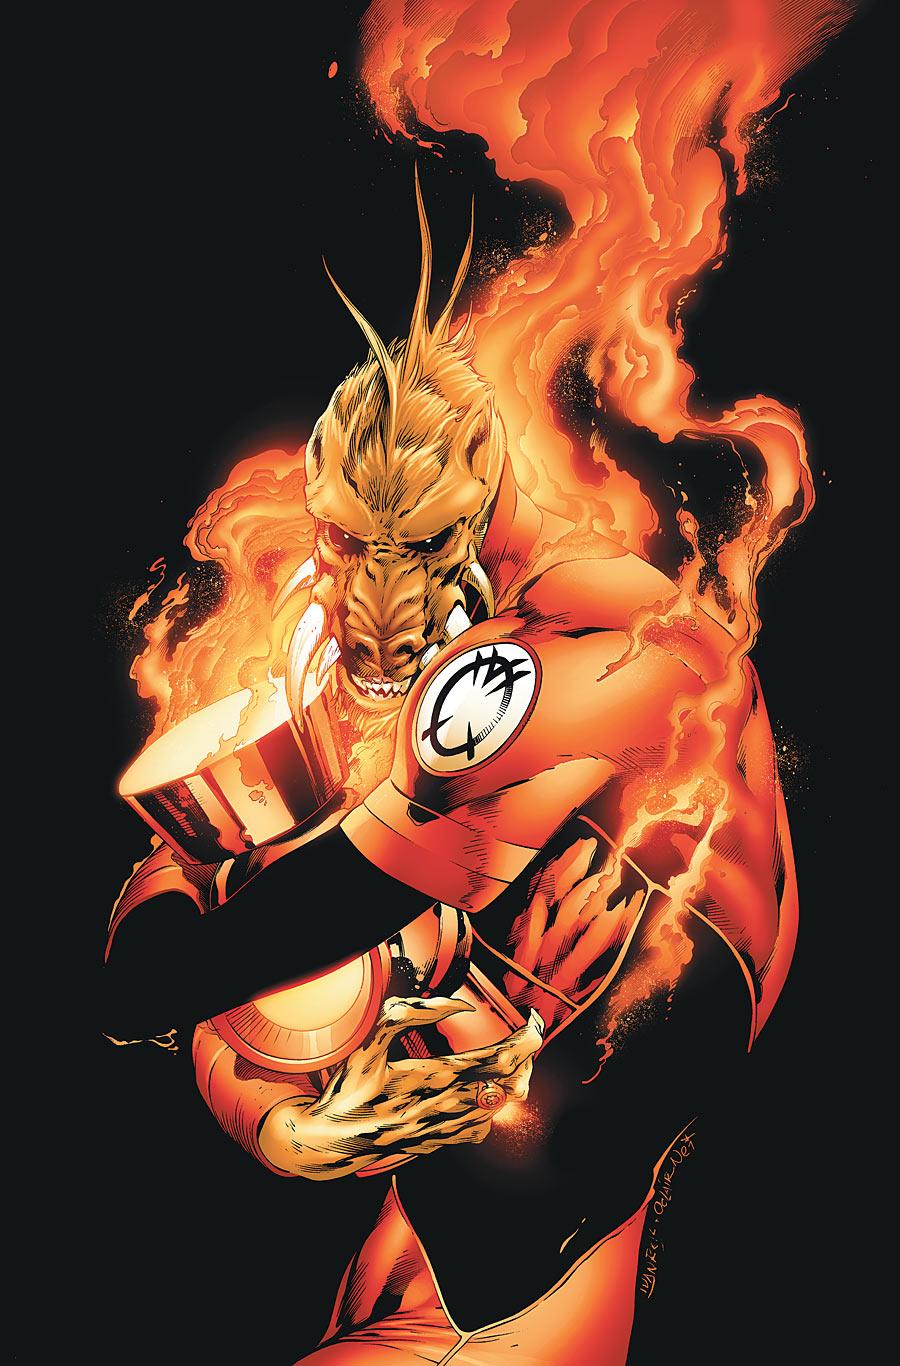 Membro da Tropa dos Lanternas Laranjas